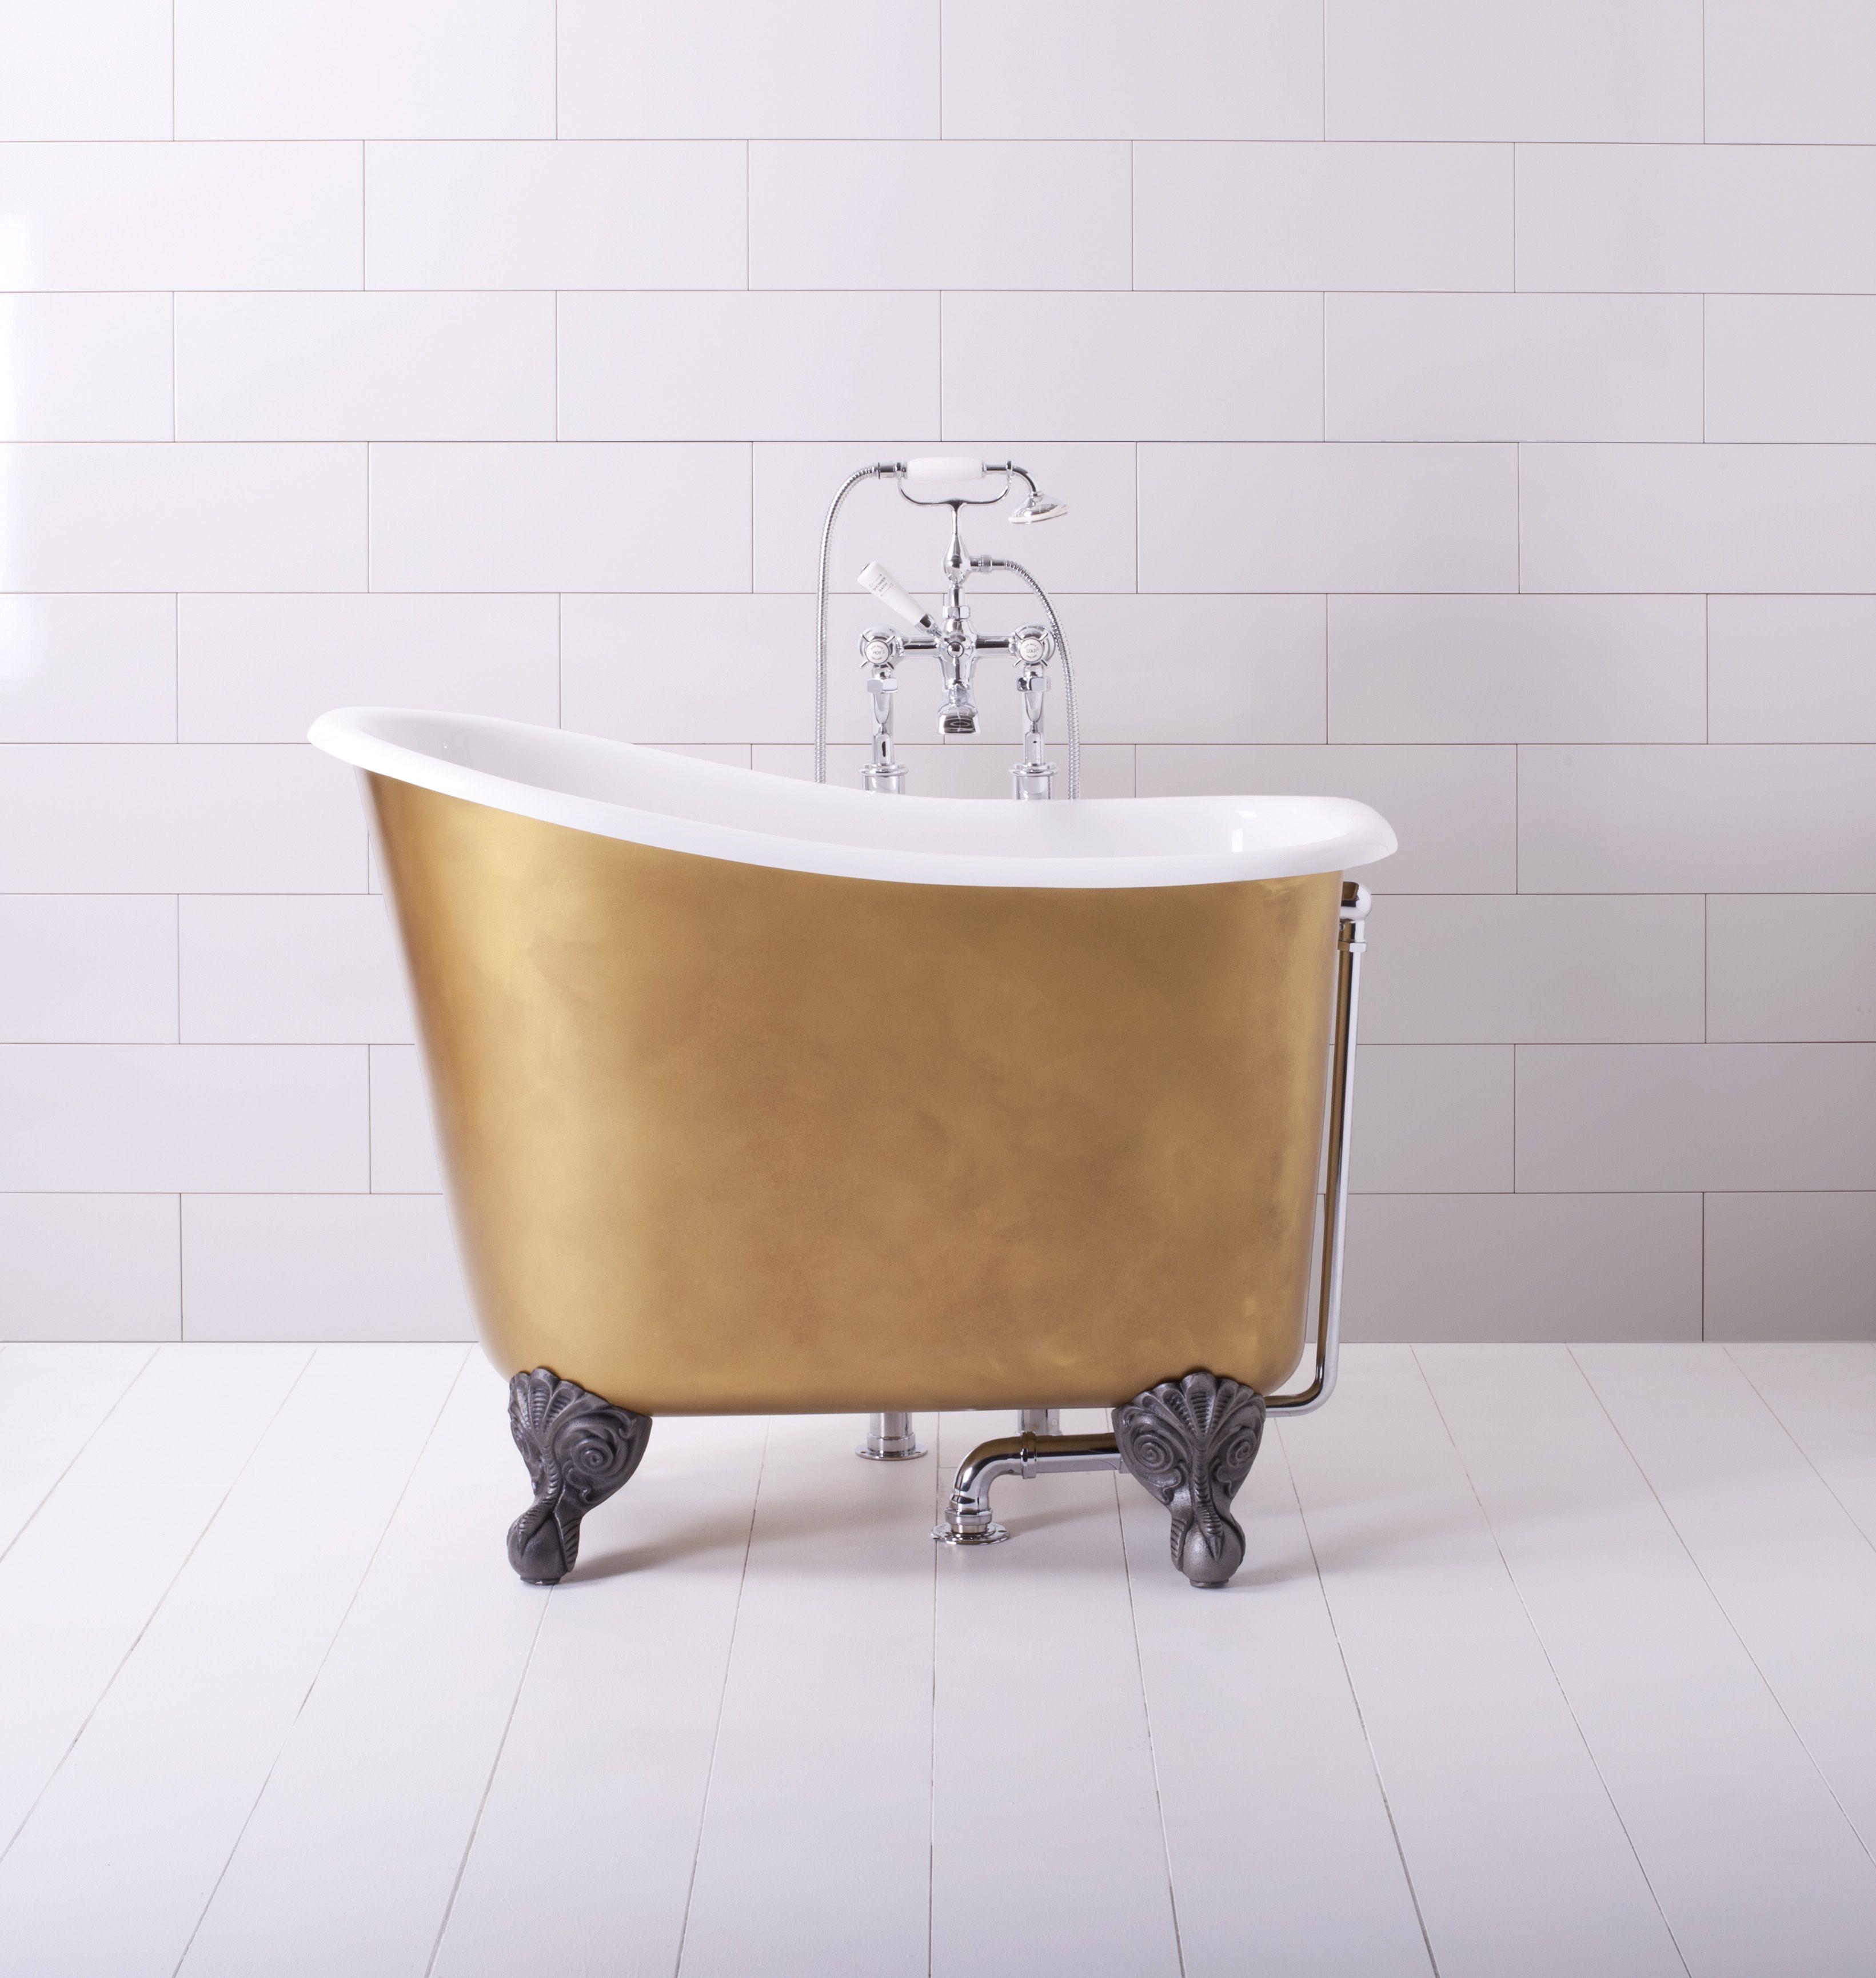 Vrijstaand bad Tubby Tub Albion Bath Co | UW-badkamer.nl | Baden ...